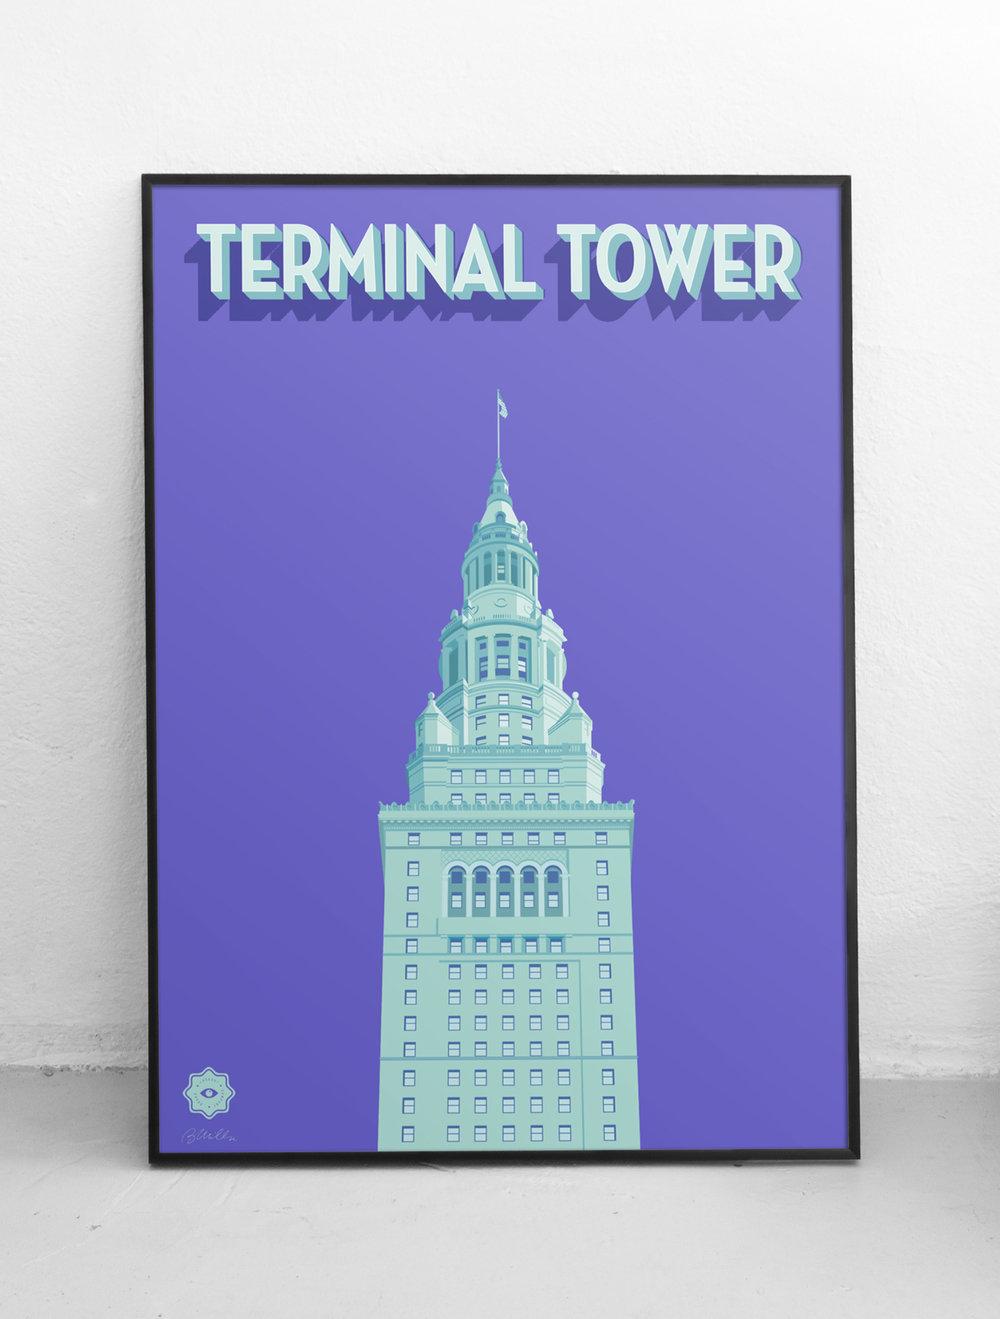 terminal_tower_frame.jpg